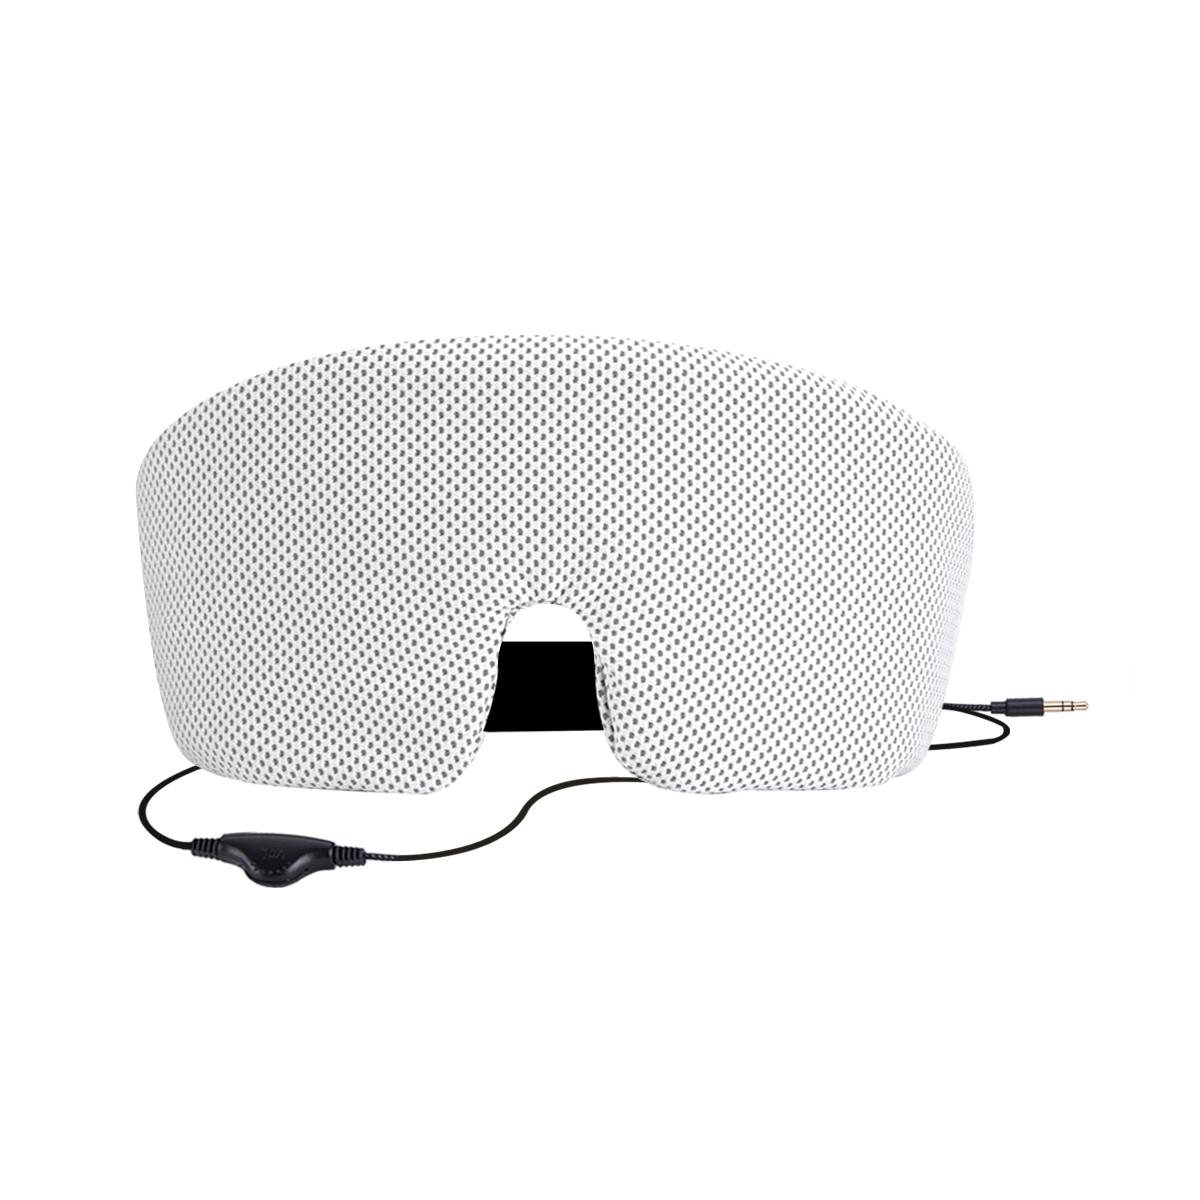 AGPtEK Ultra Soft Comfortable Wired Sleep Headphones Eye Mask Built-in HD Audio Speaker,Perfect for Bedtime & Travel &Meditation